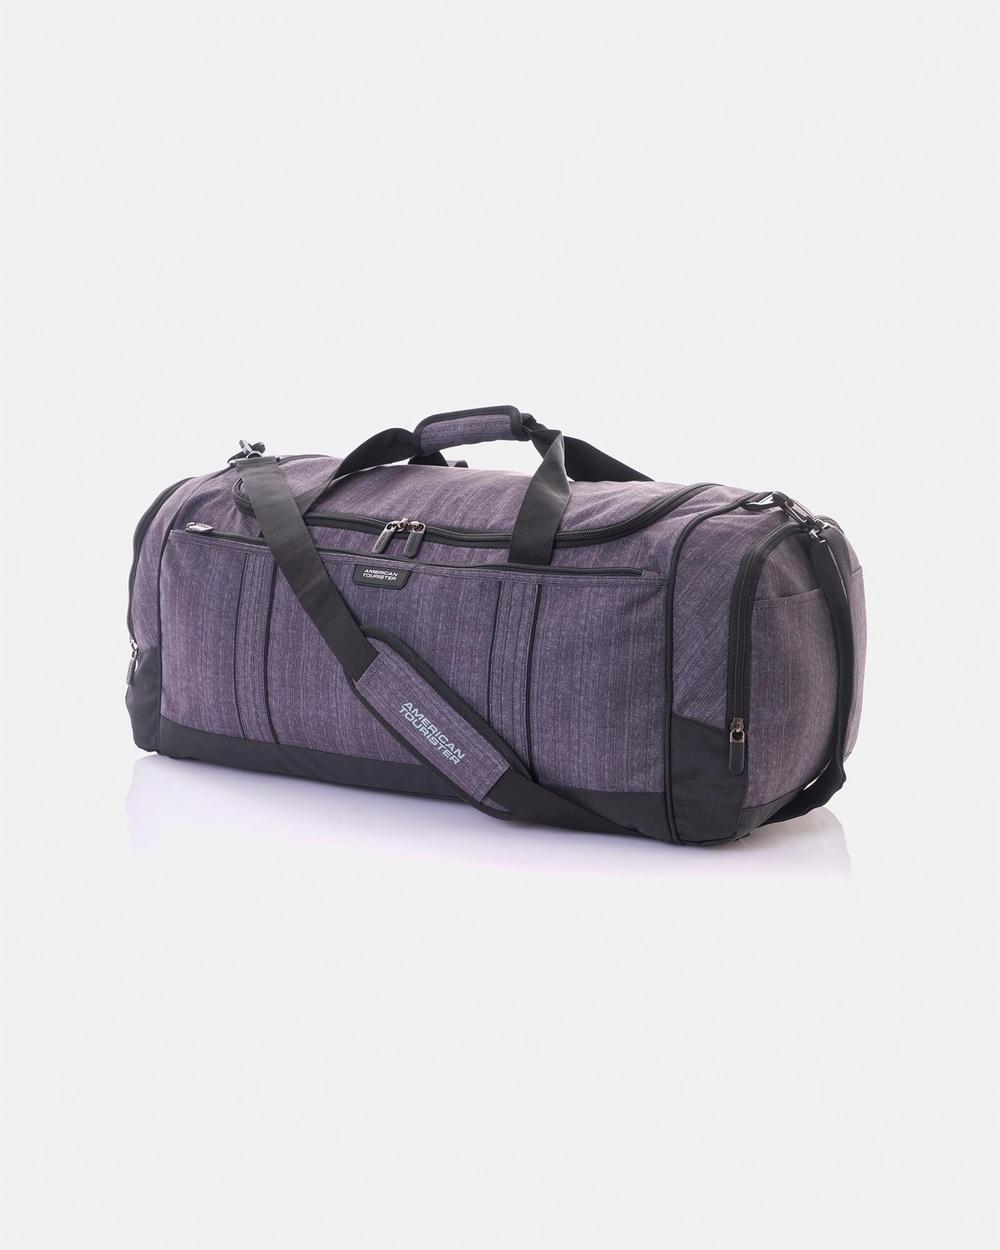 American Tourister Travel Duffle 1 67cm Bags Gunmetal